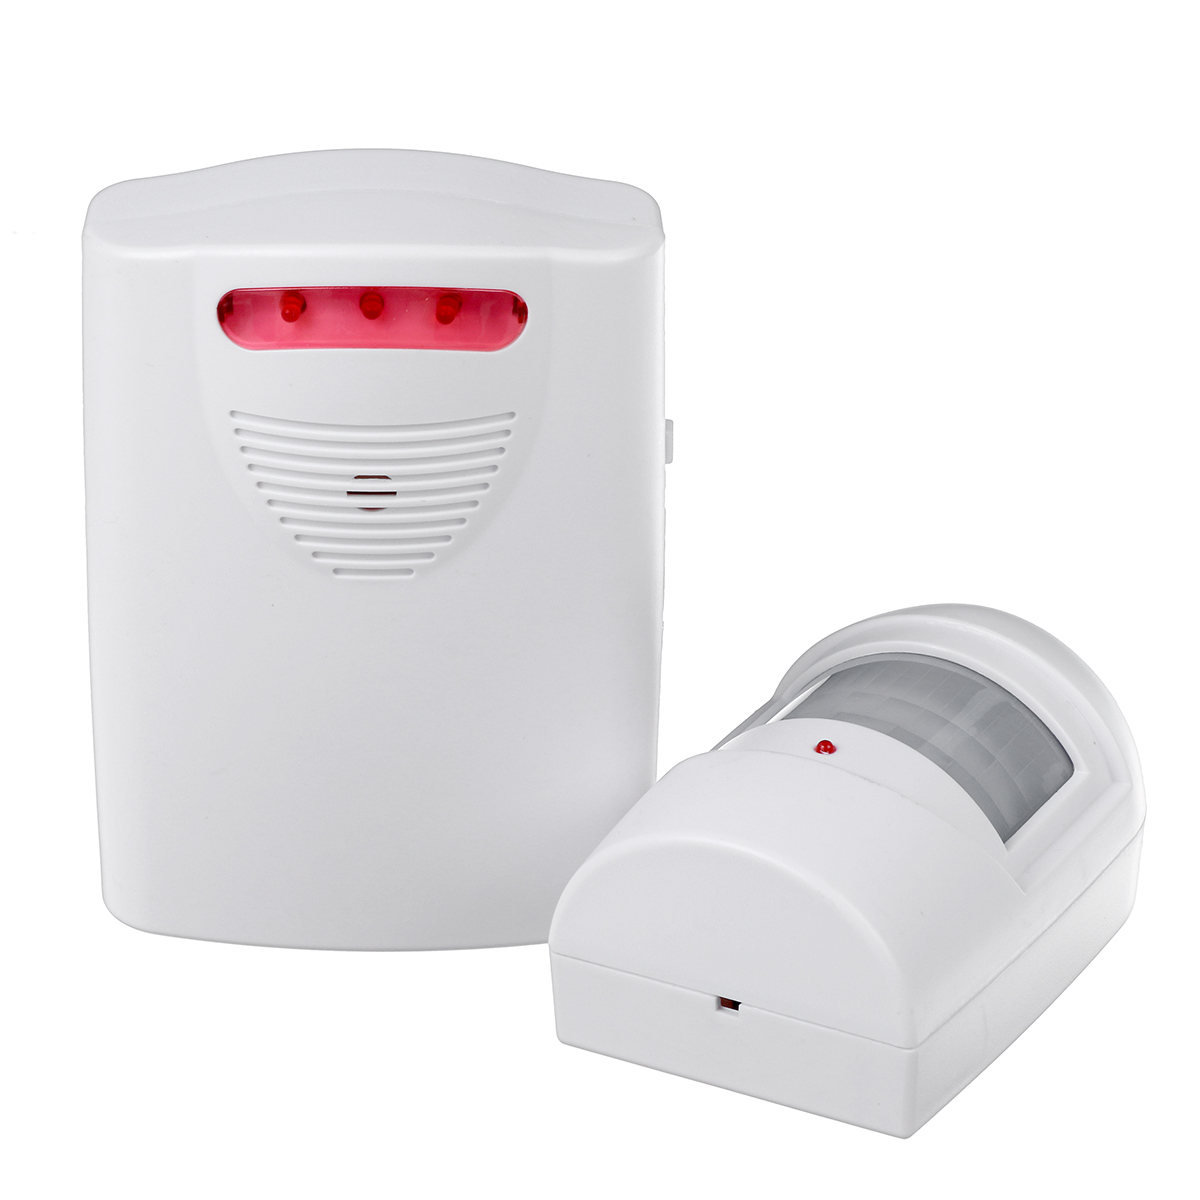 Bakeey Wireless PIR Sensor Motion Alarm Sensor Low Power LED Reminder Infrared Detector